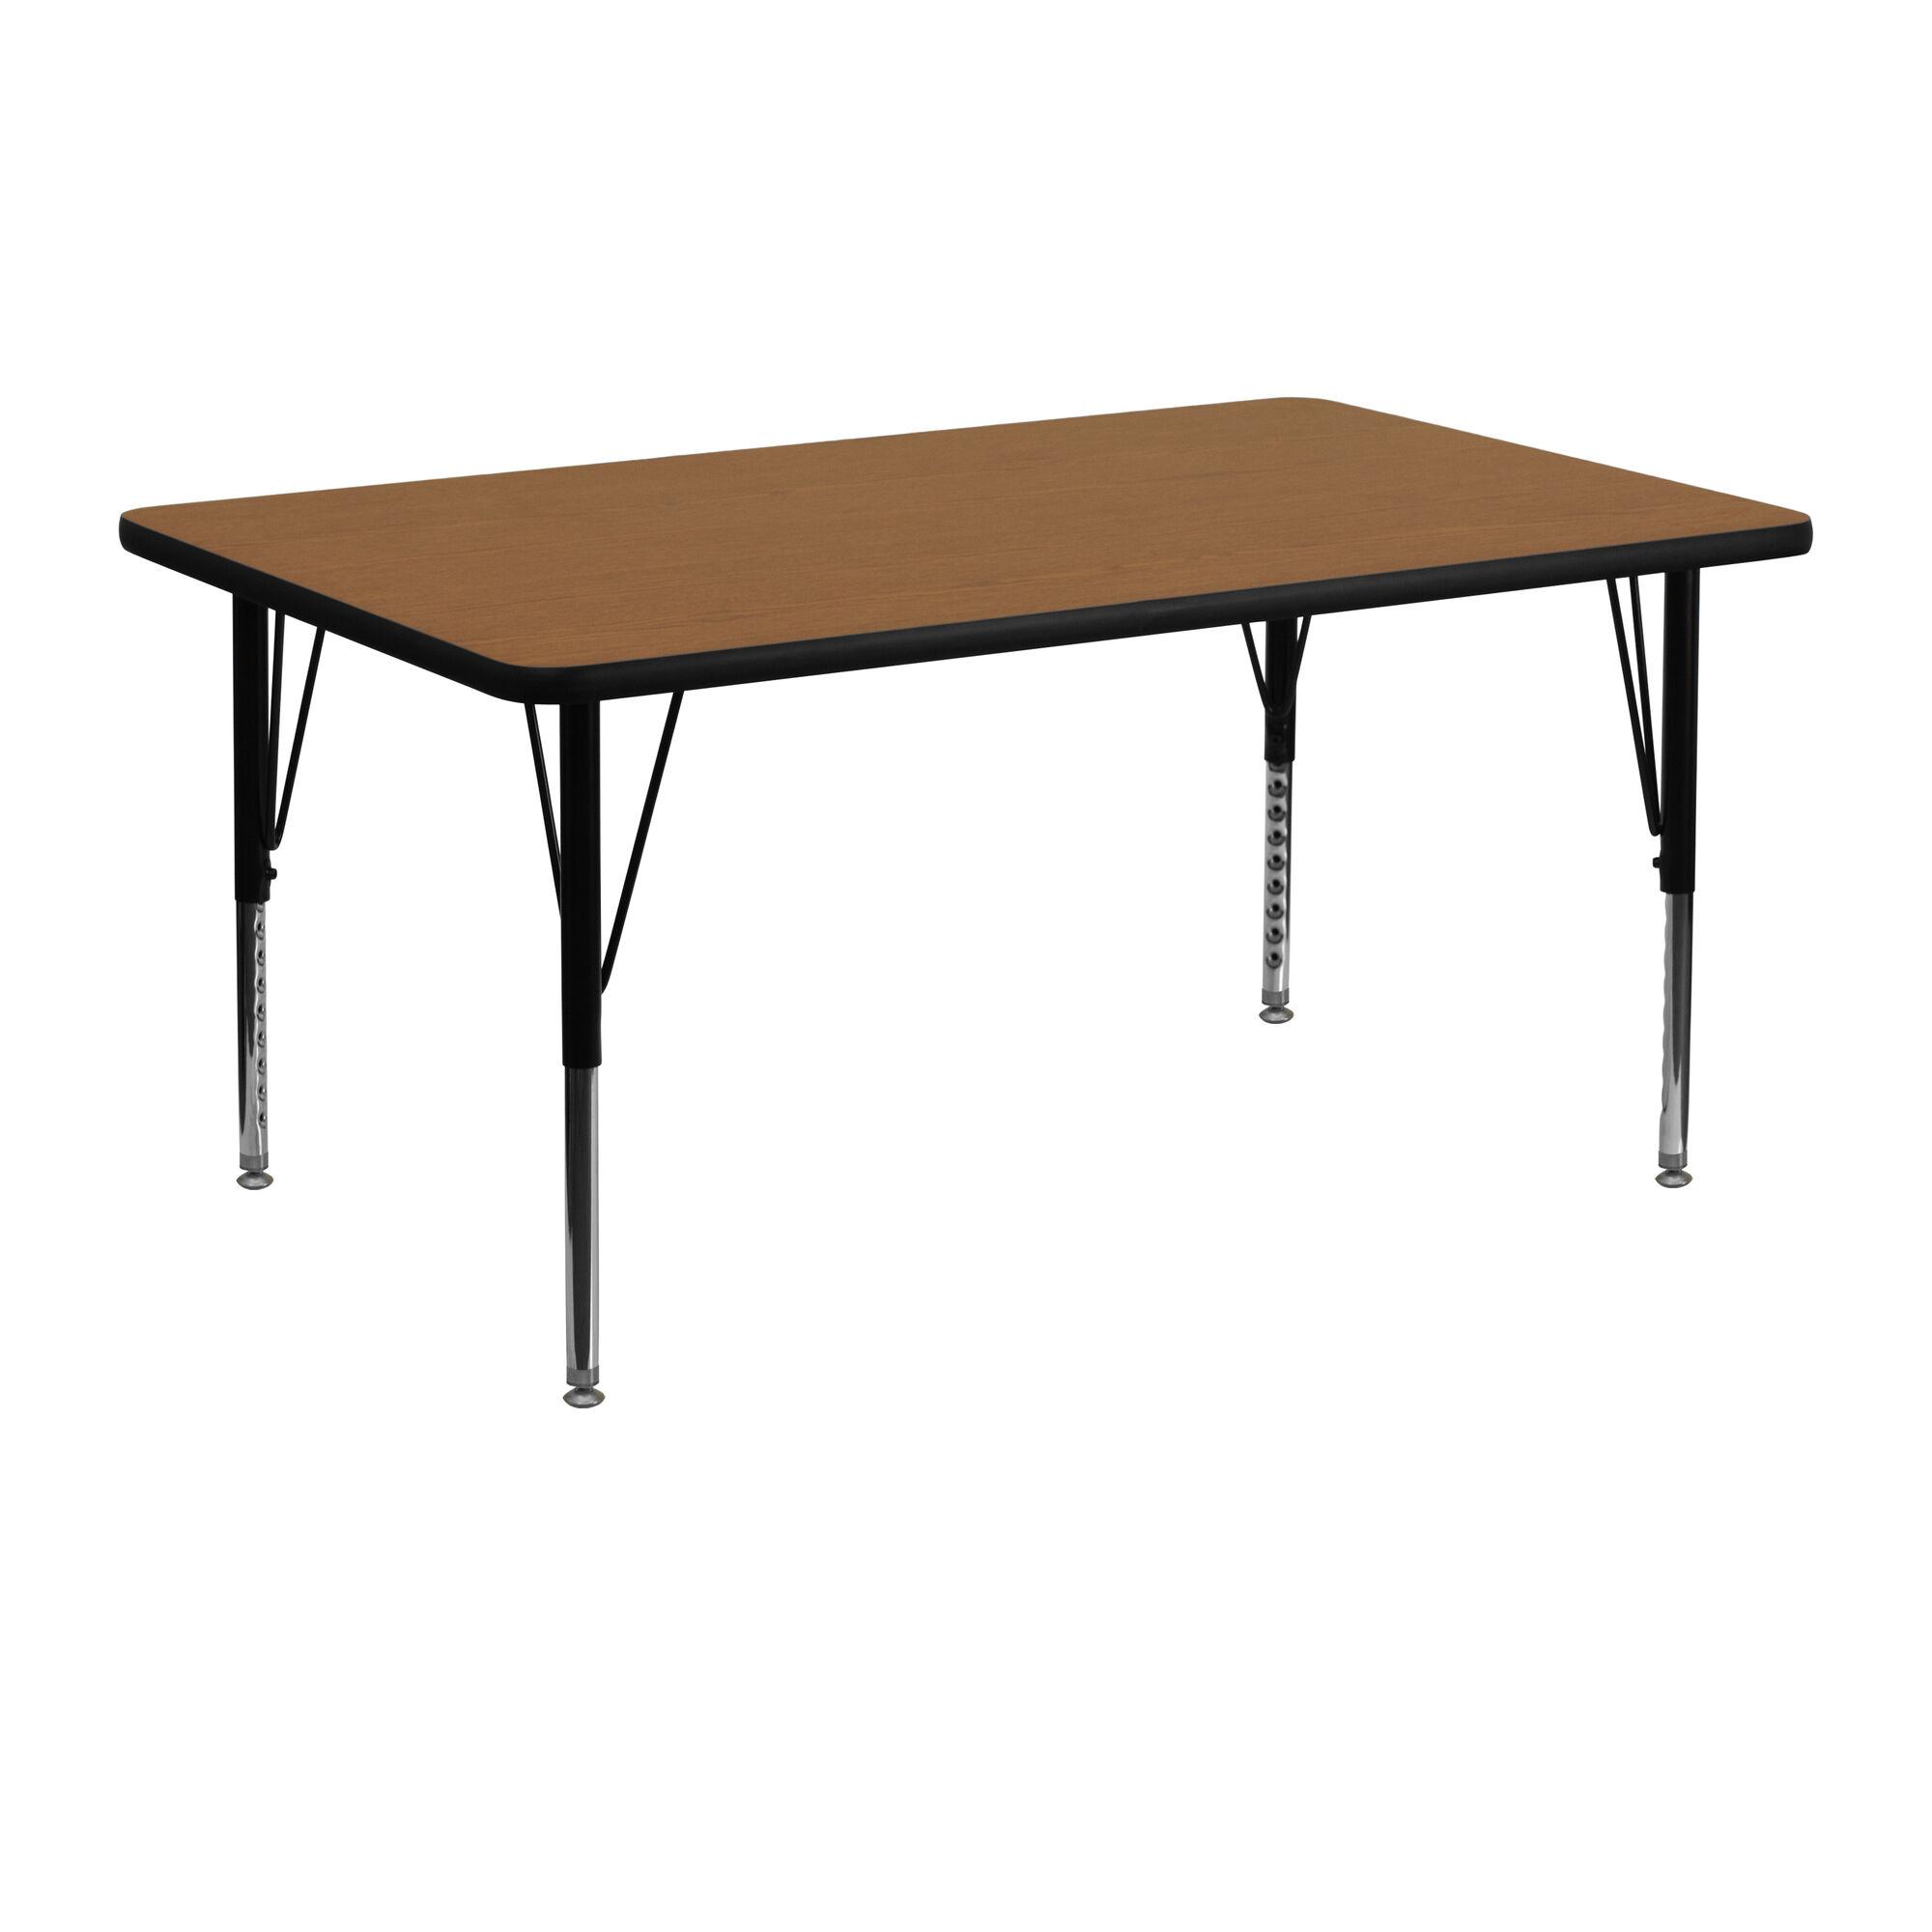 Flash furniture 24 39 39 w x 48 39 39 l rectangular oak thermal for Furniture 24